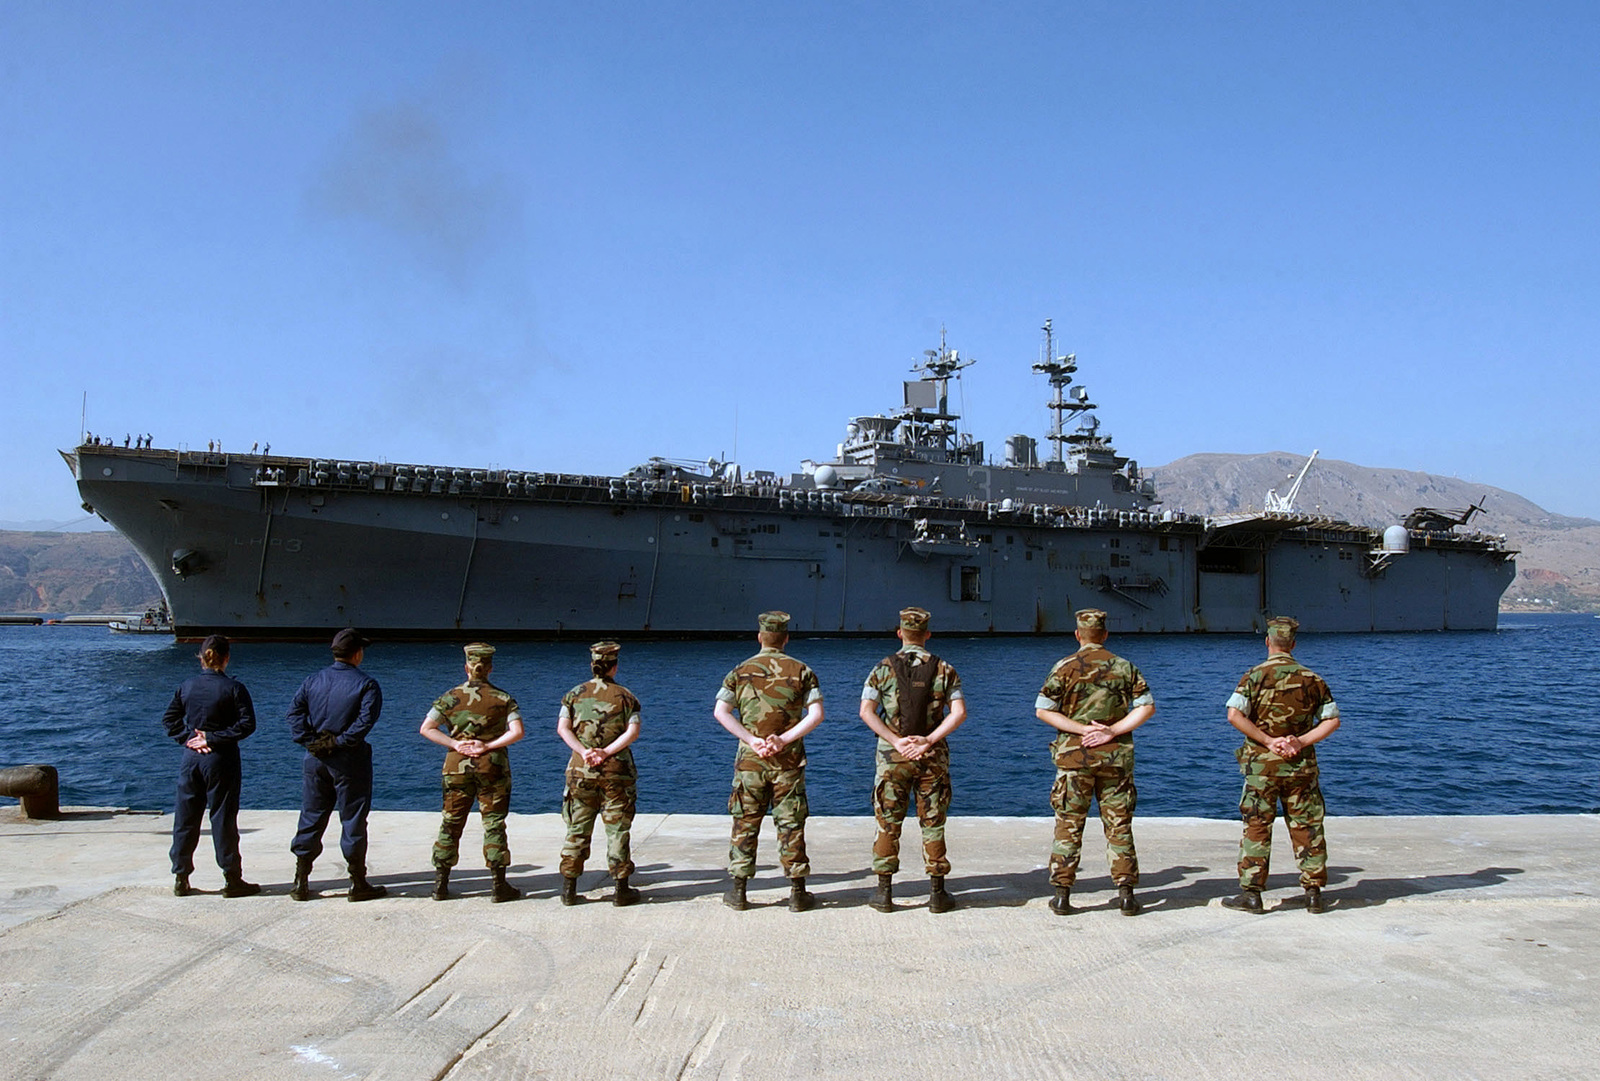 US Navy (USN) volunteer linehandlers, from Naval Station Activity (NSA) Souda Bay, wait on the pier